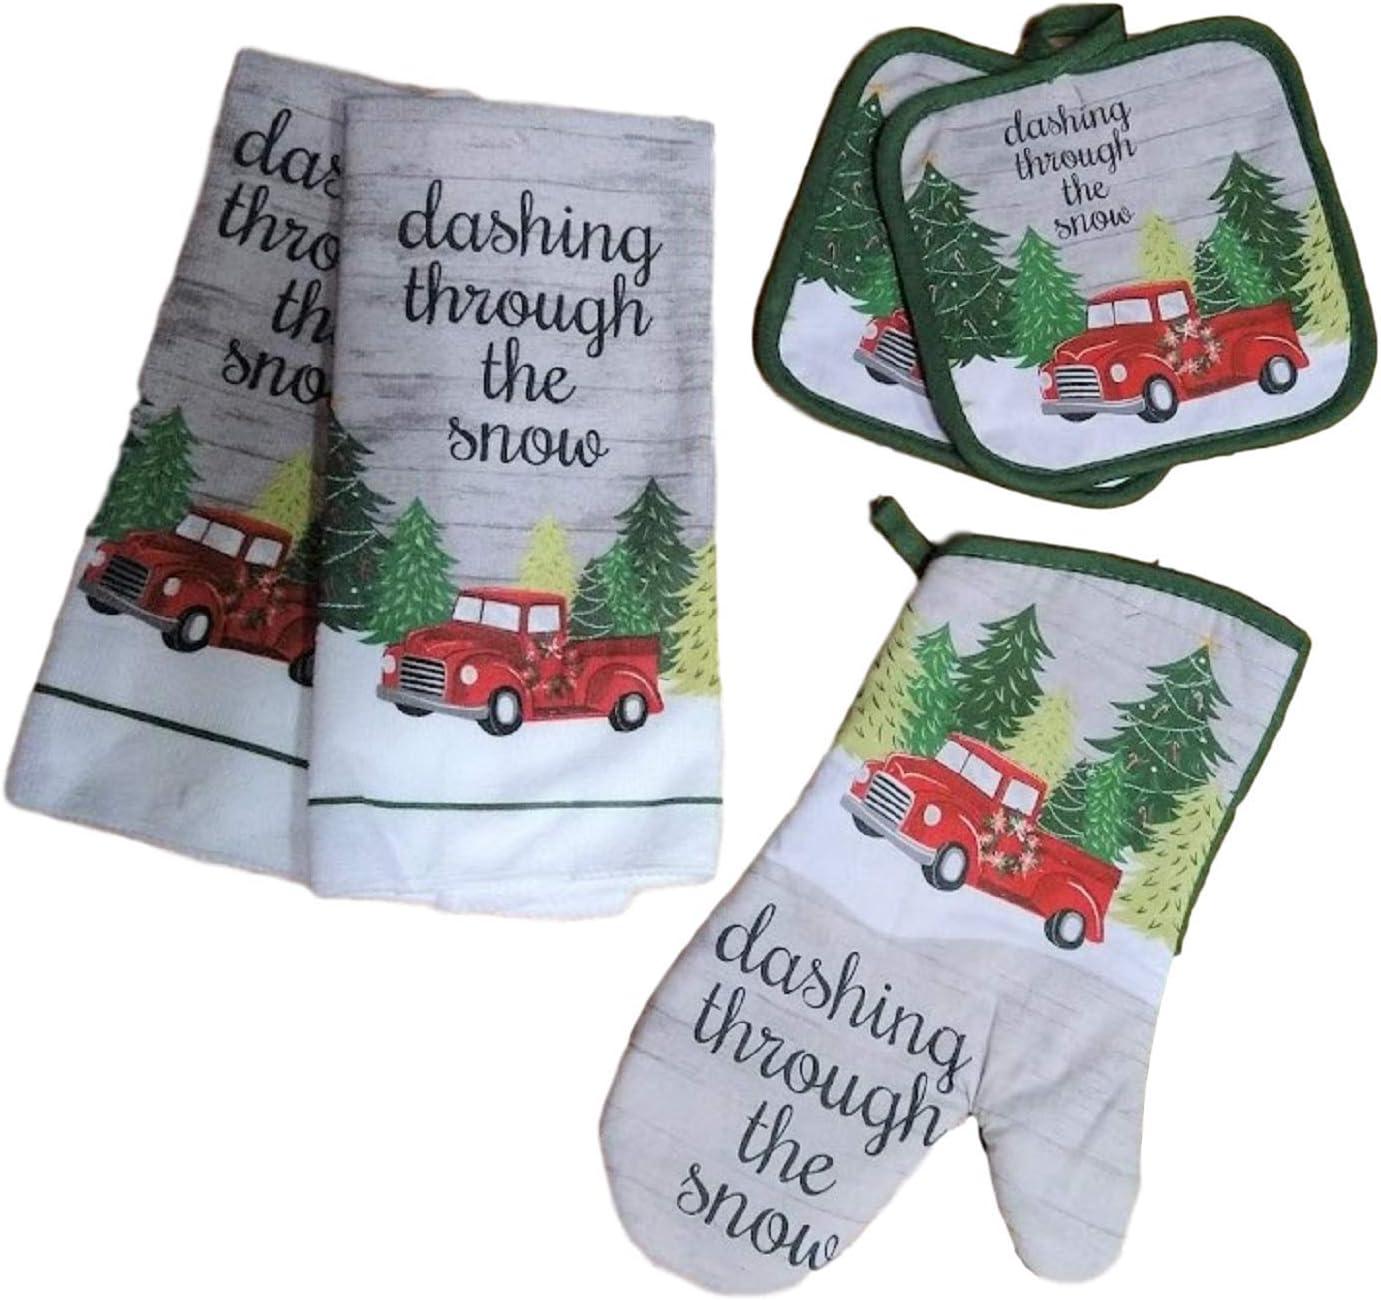 Greenbriar Christmas House Kitchen Linen Set Dashing Through The Snow Christmas Towels 5 Piece Set